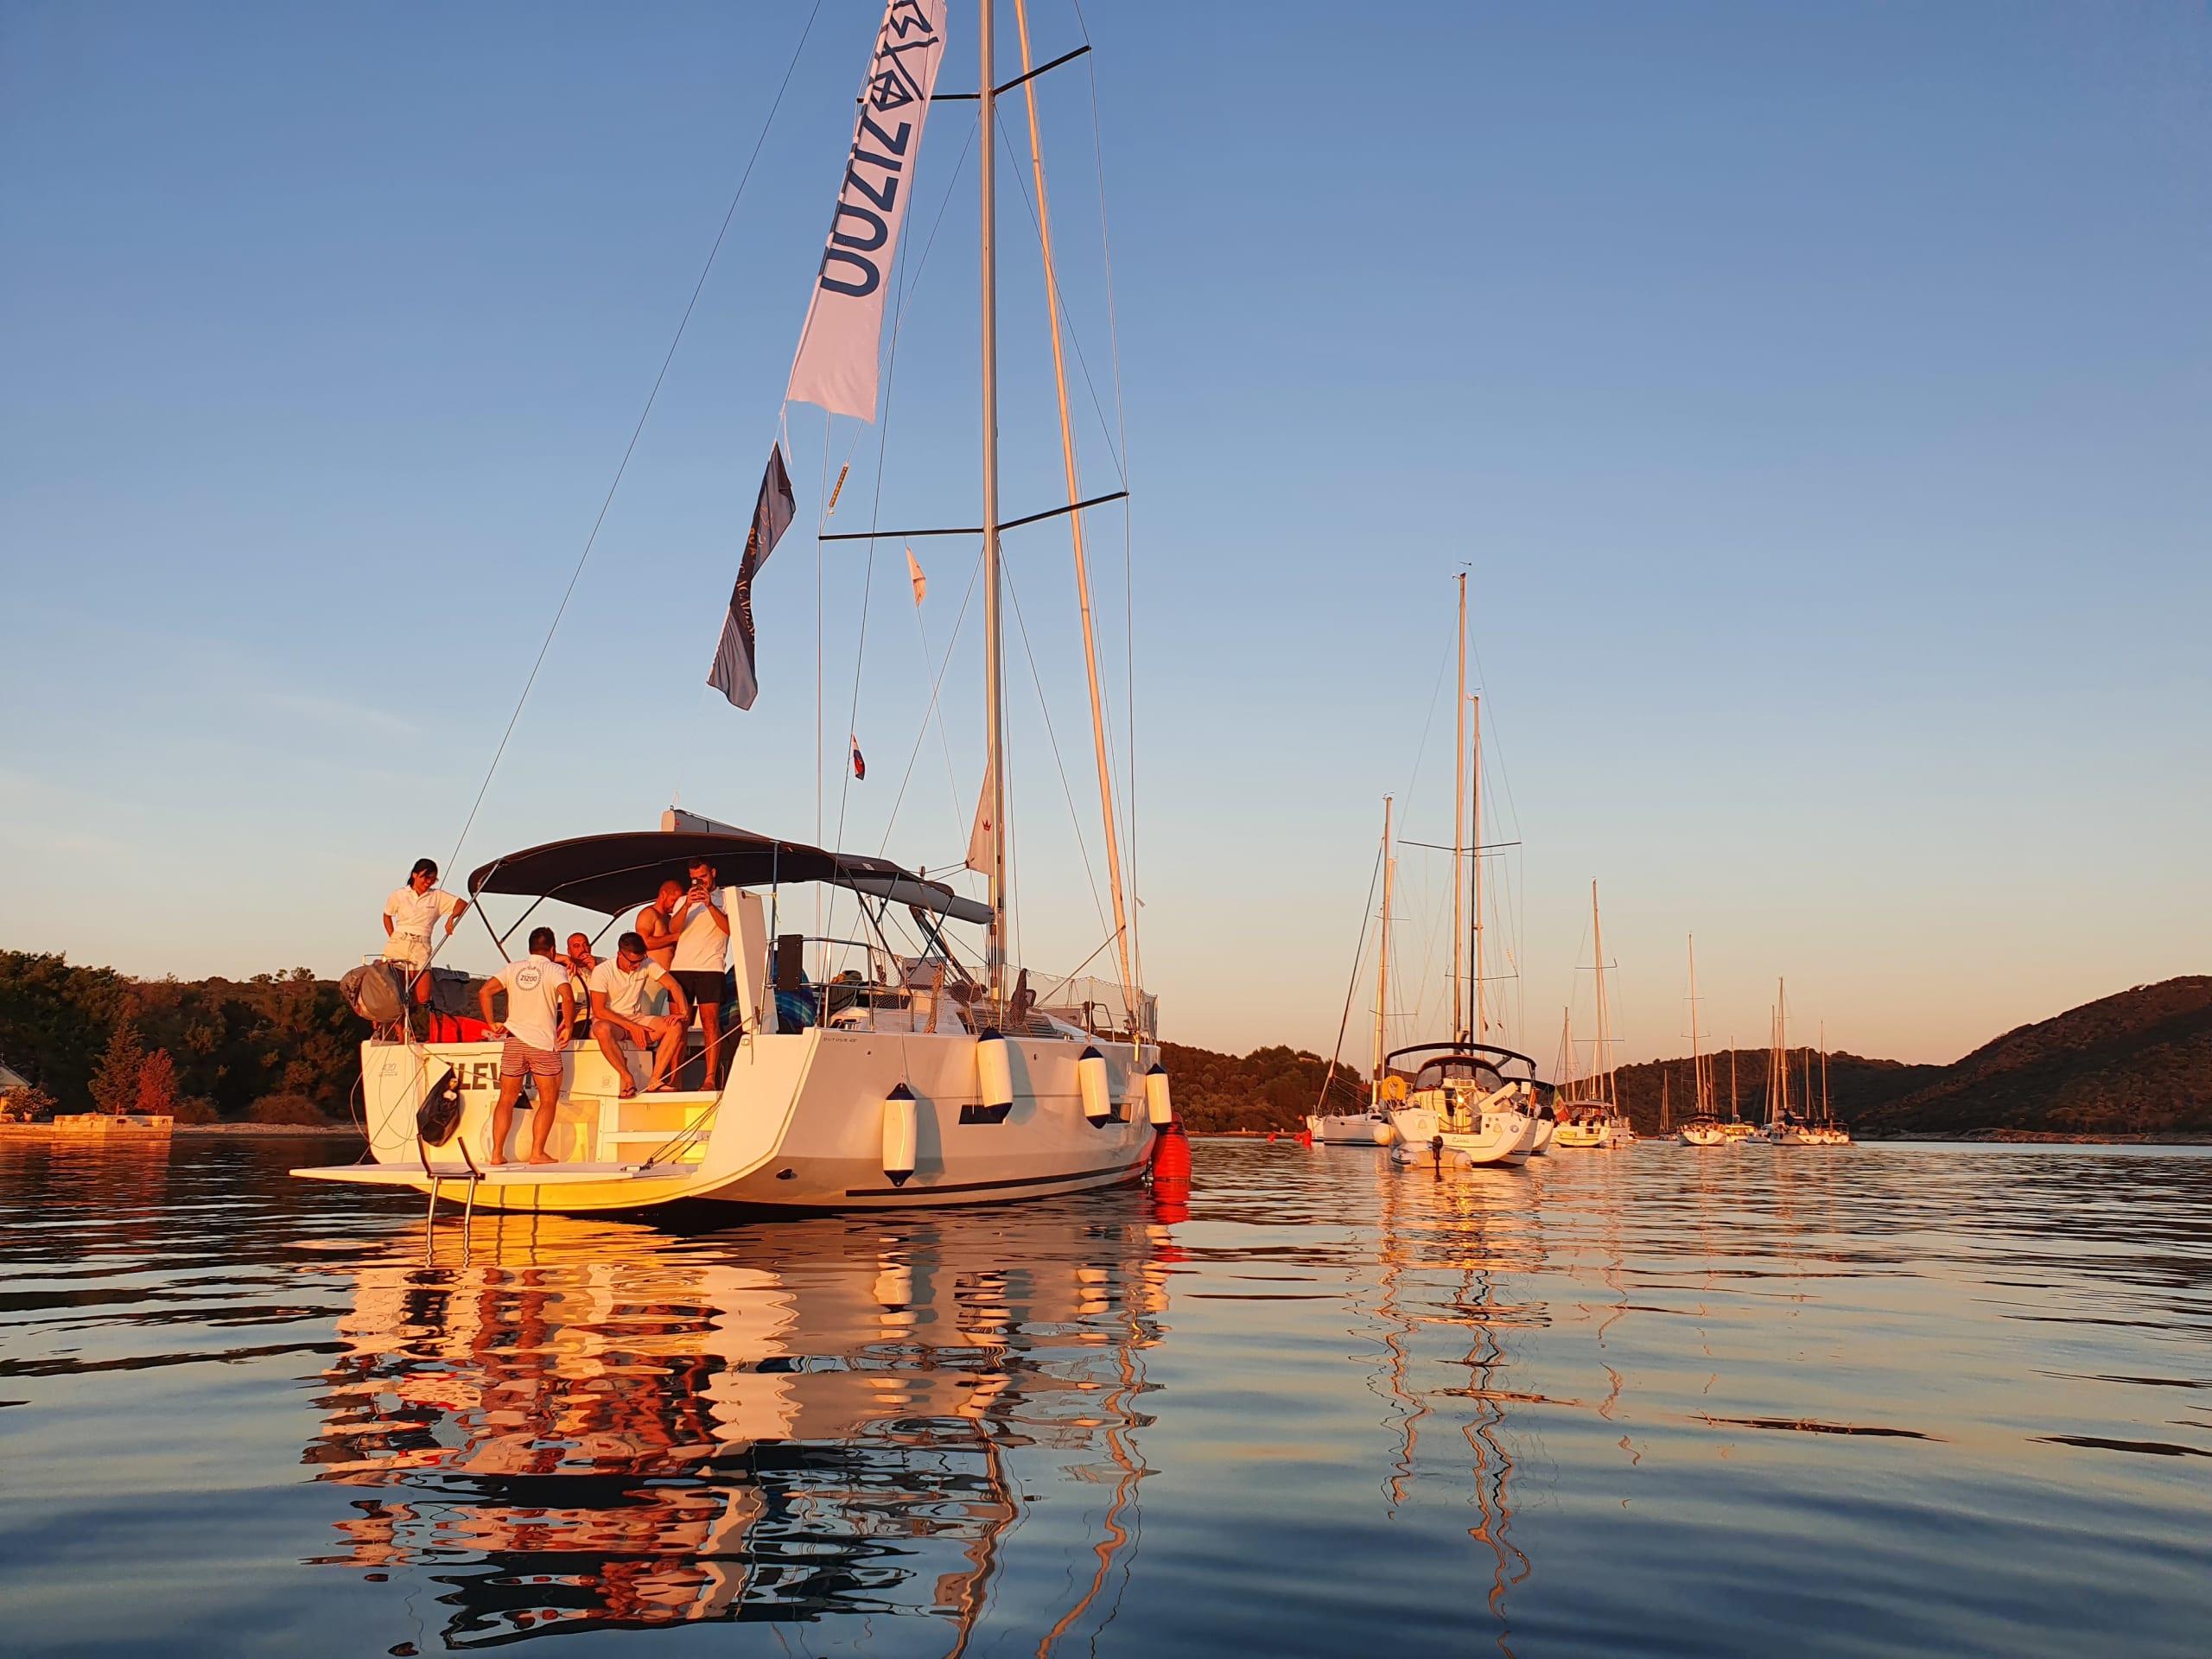 Sailing in Croatia with ZIZOO